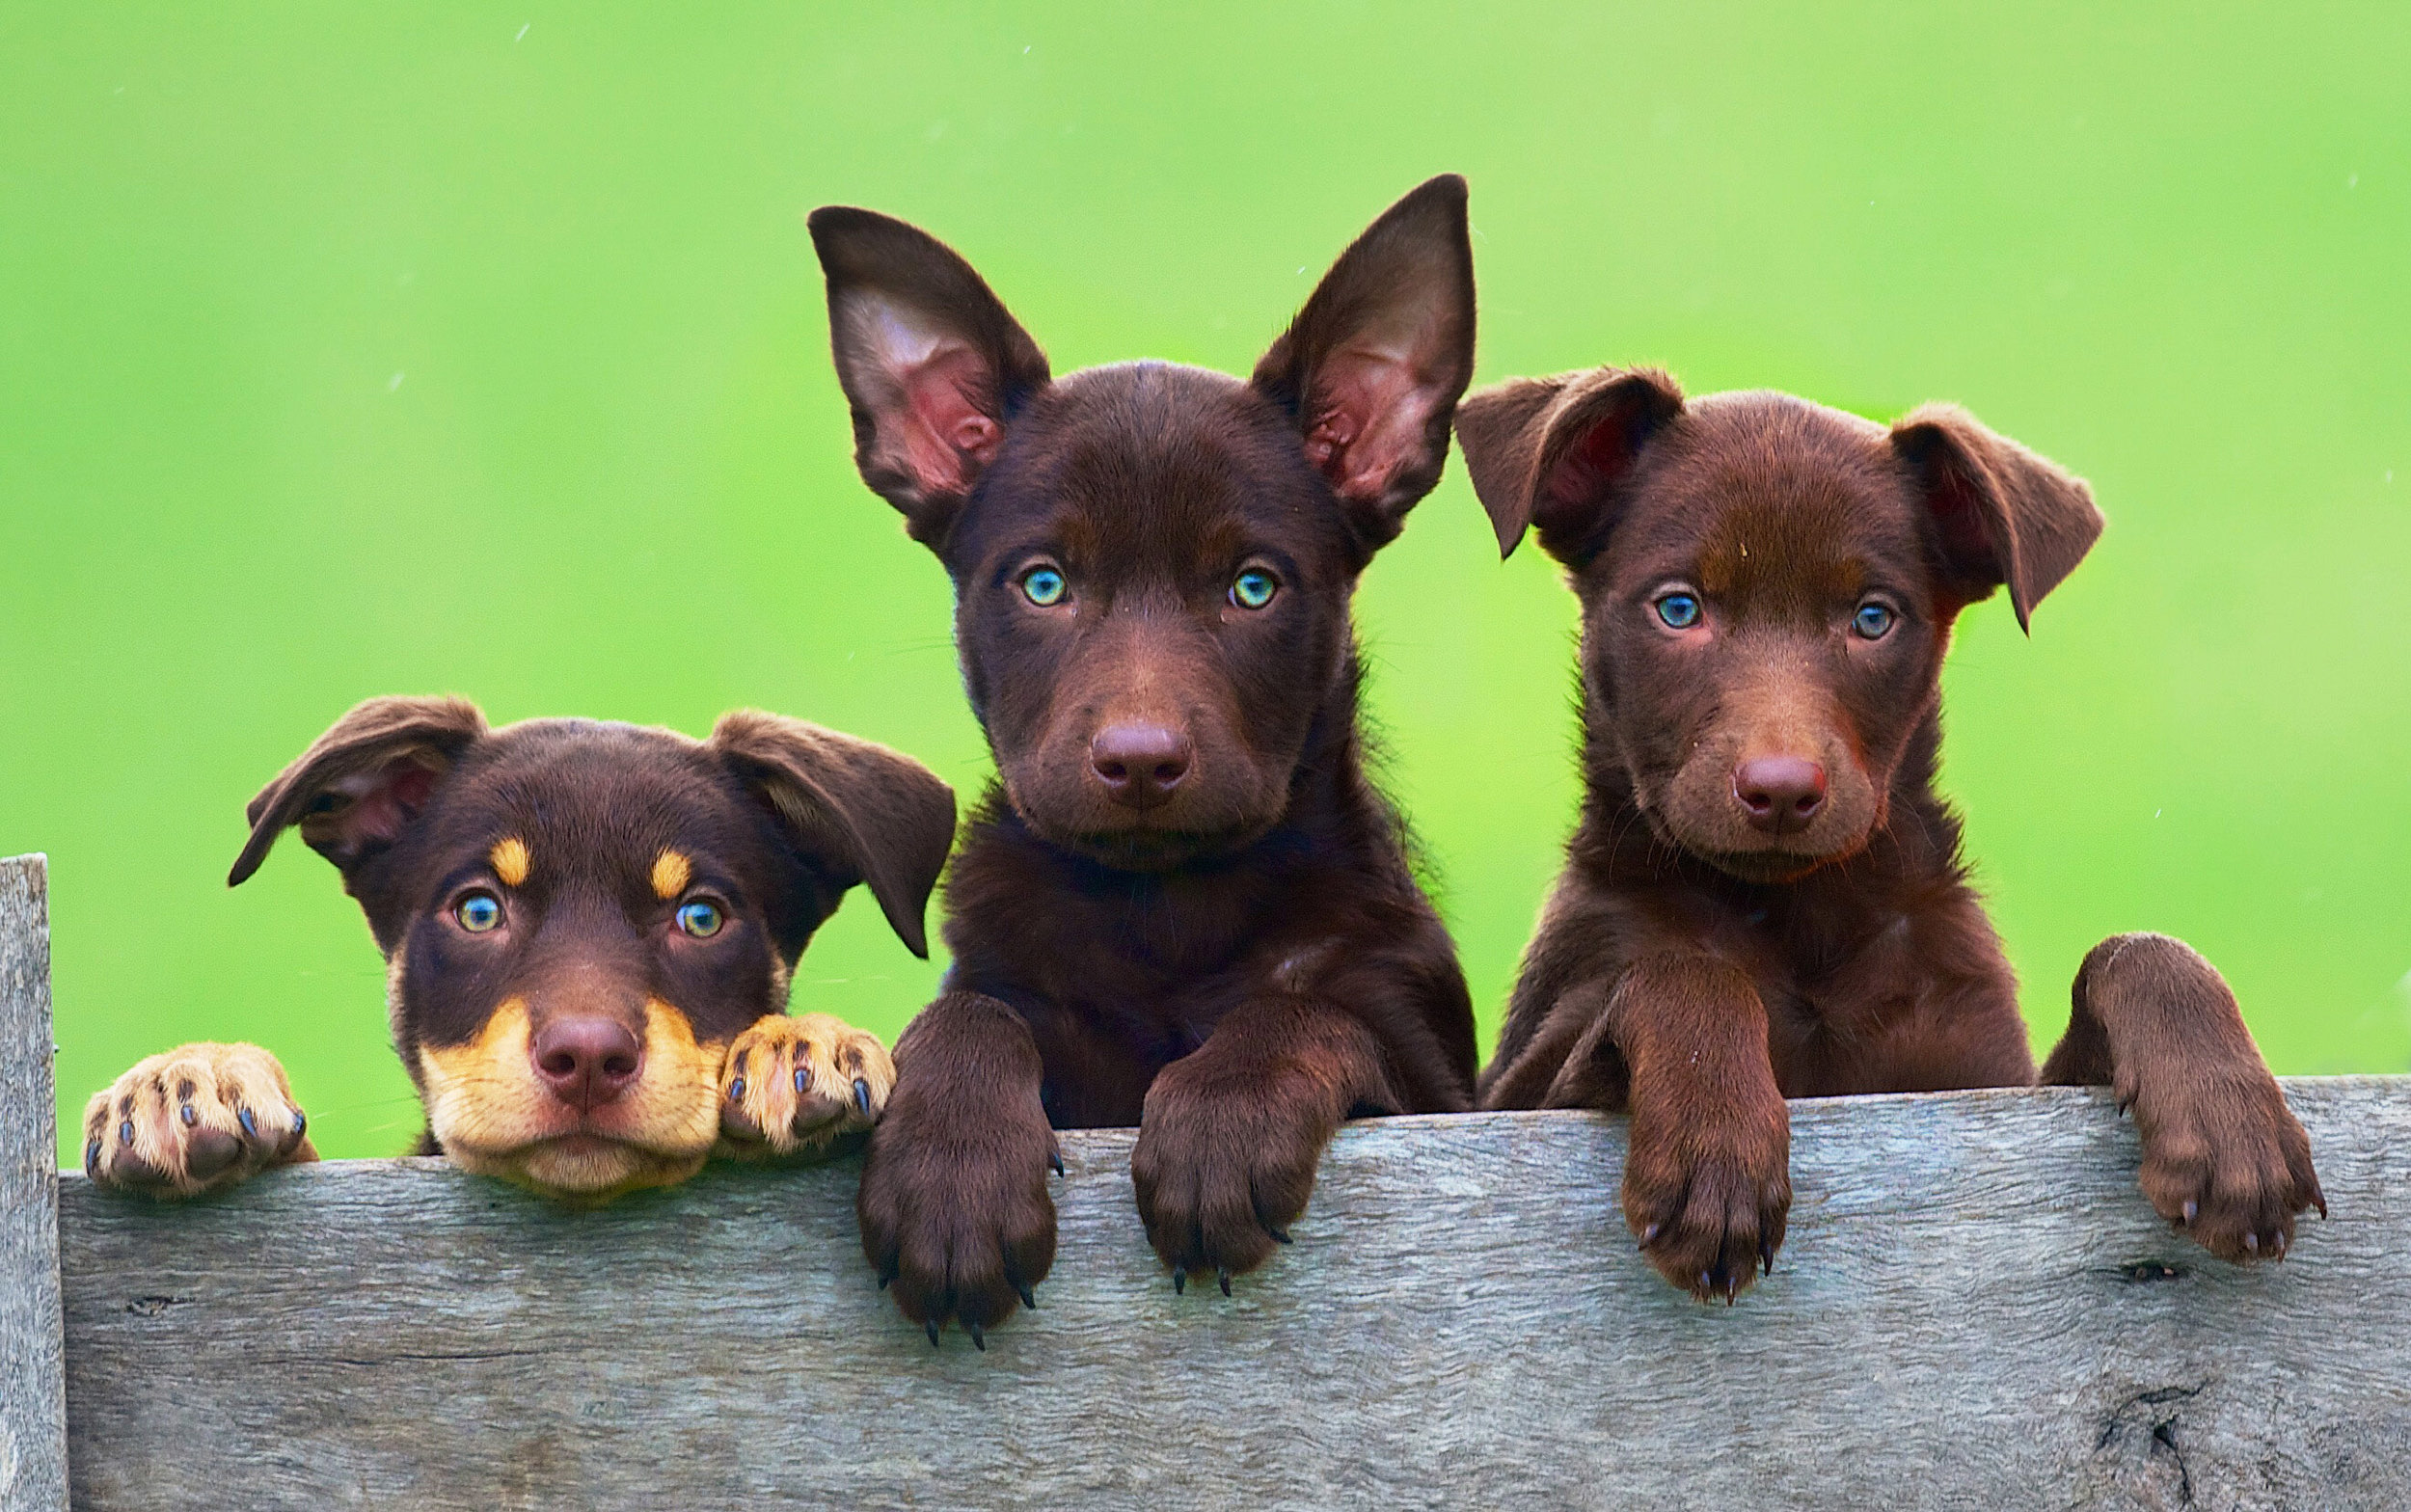 CHP_Export_2838999_Puppies in preparation at the Beloka Sheep dog trials at Welshpool. Contact P.jpg